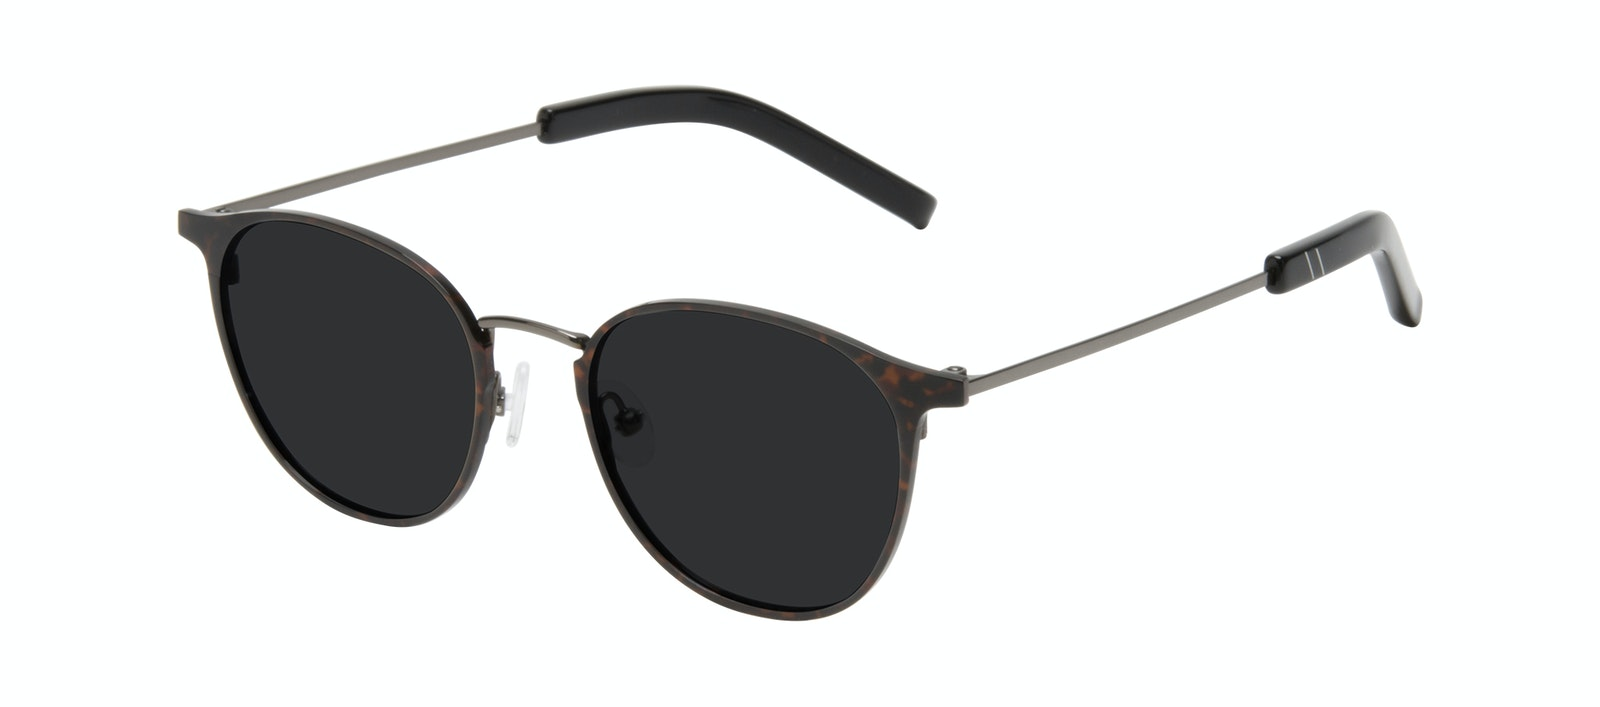 Affordable Fashion Glasses Round Sunglasses Men Point Tortoise Tilt